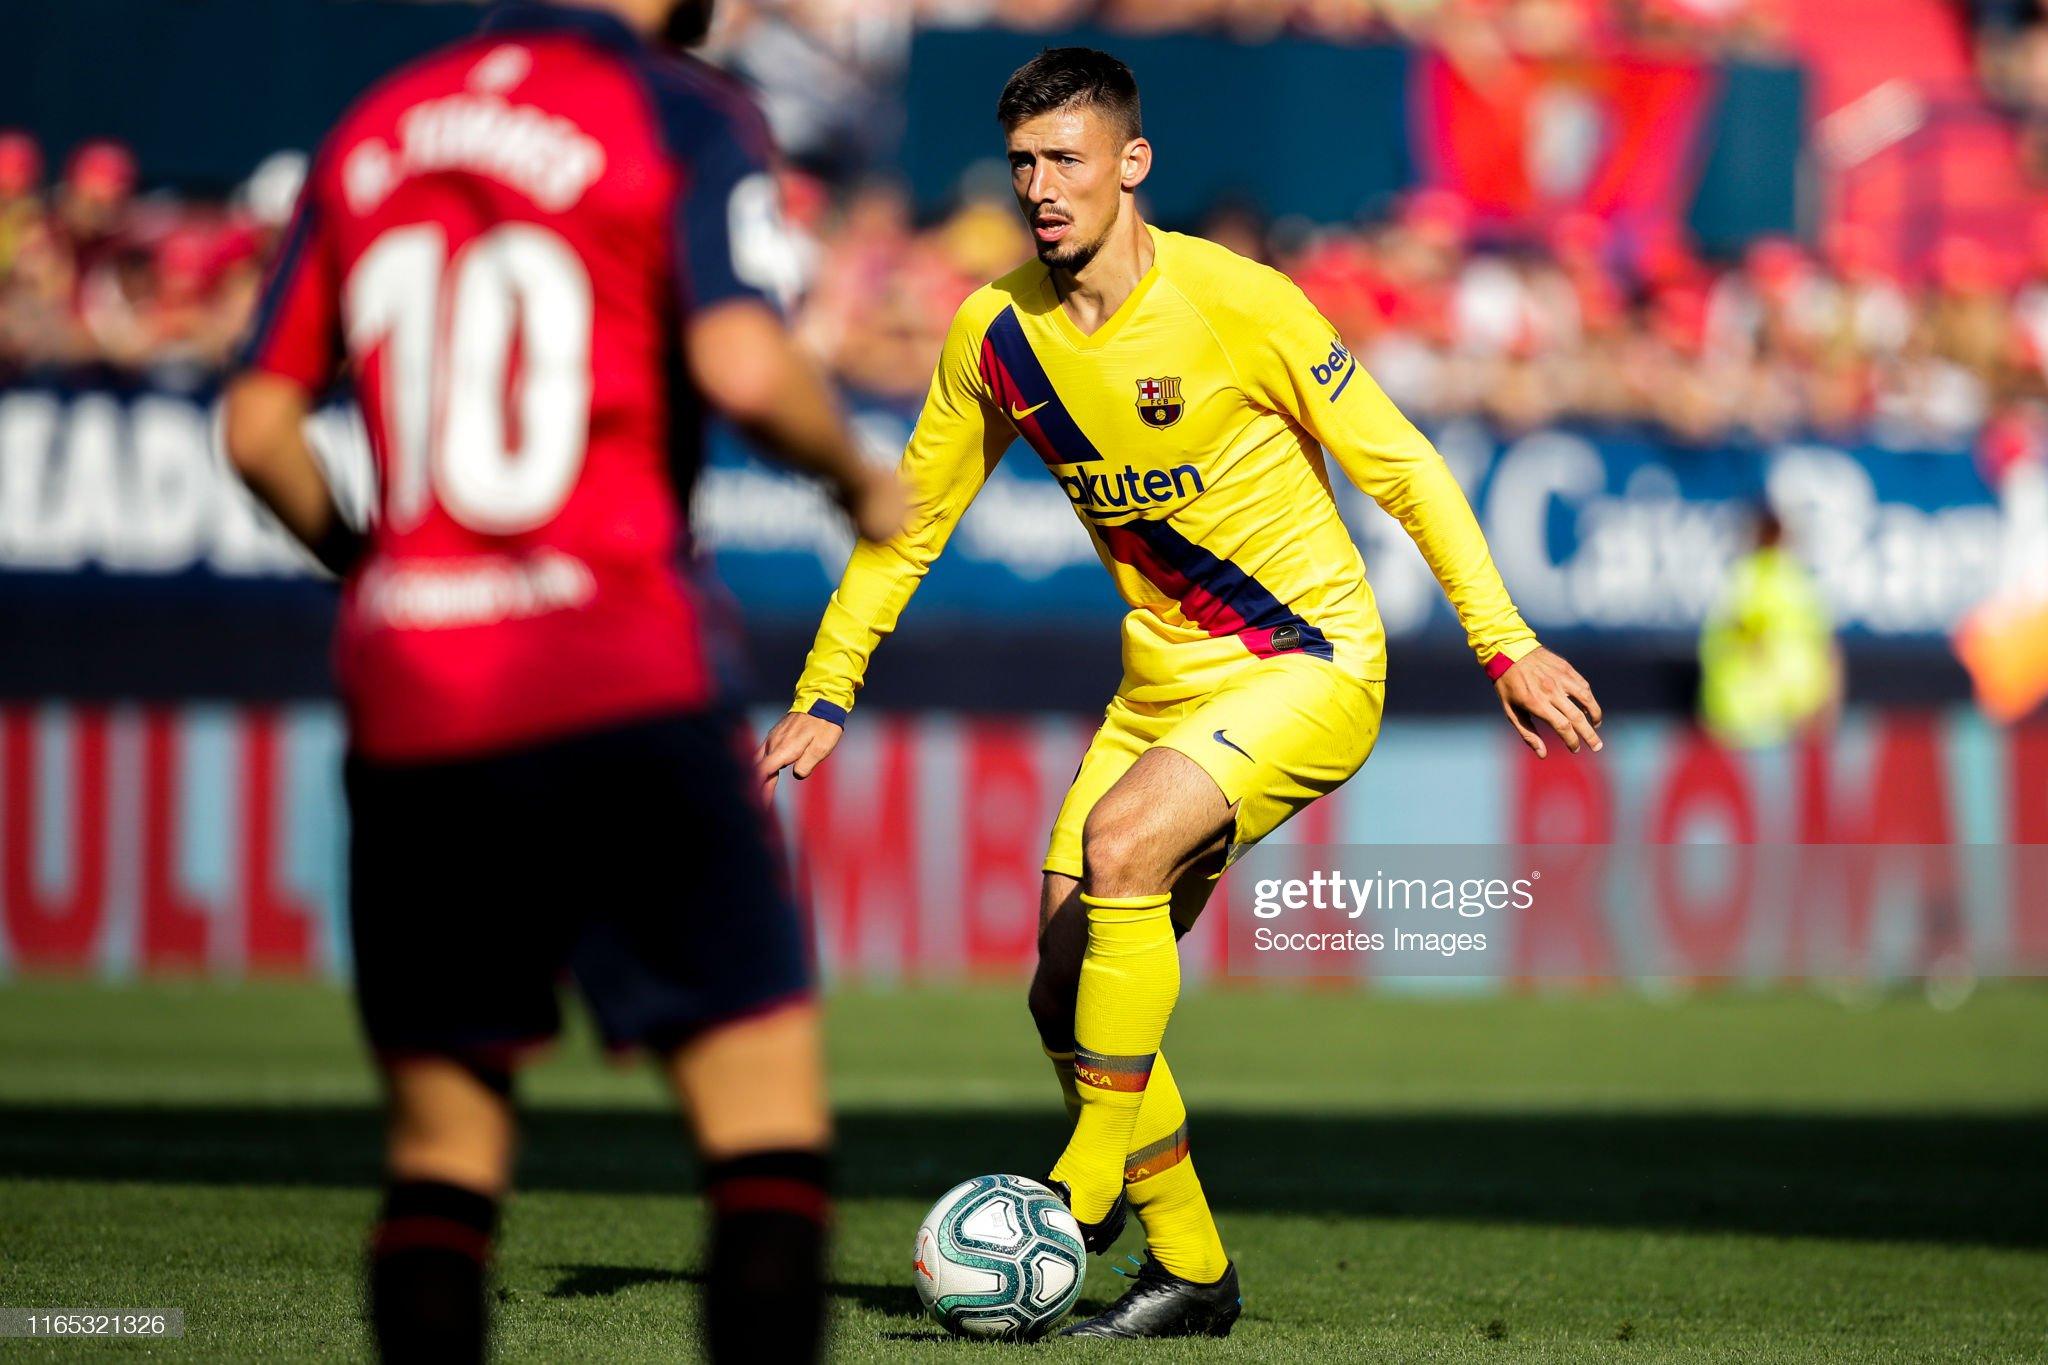 صور مباراة : أوساسونا - برشلونة 2-2 ( 31-08-2019 )  Clement-lenglet-of-fc-barcelona-during-the-la-liga-santander-match-picture-id1165321326?s=2048x2048